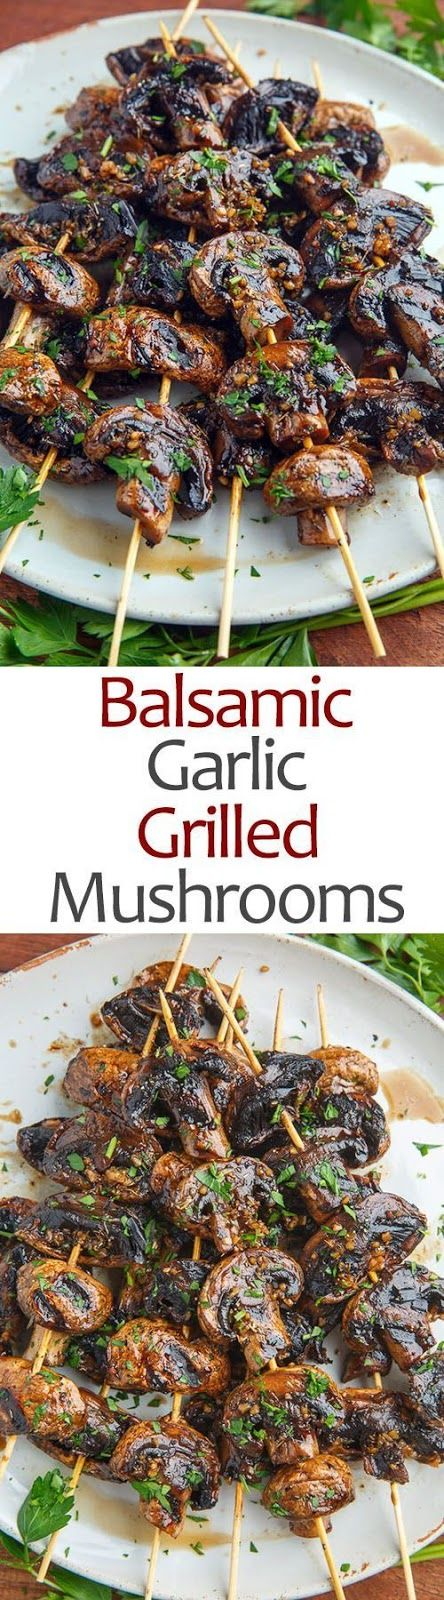 Balsamic Garlic Grilled Mushroom Skewers | Food And Cake Recipes